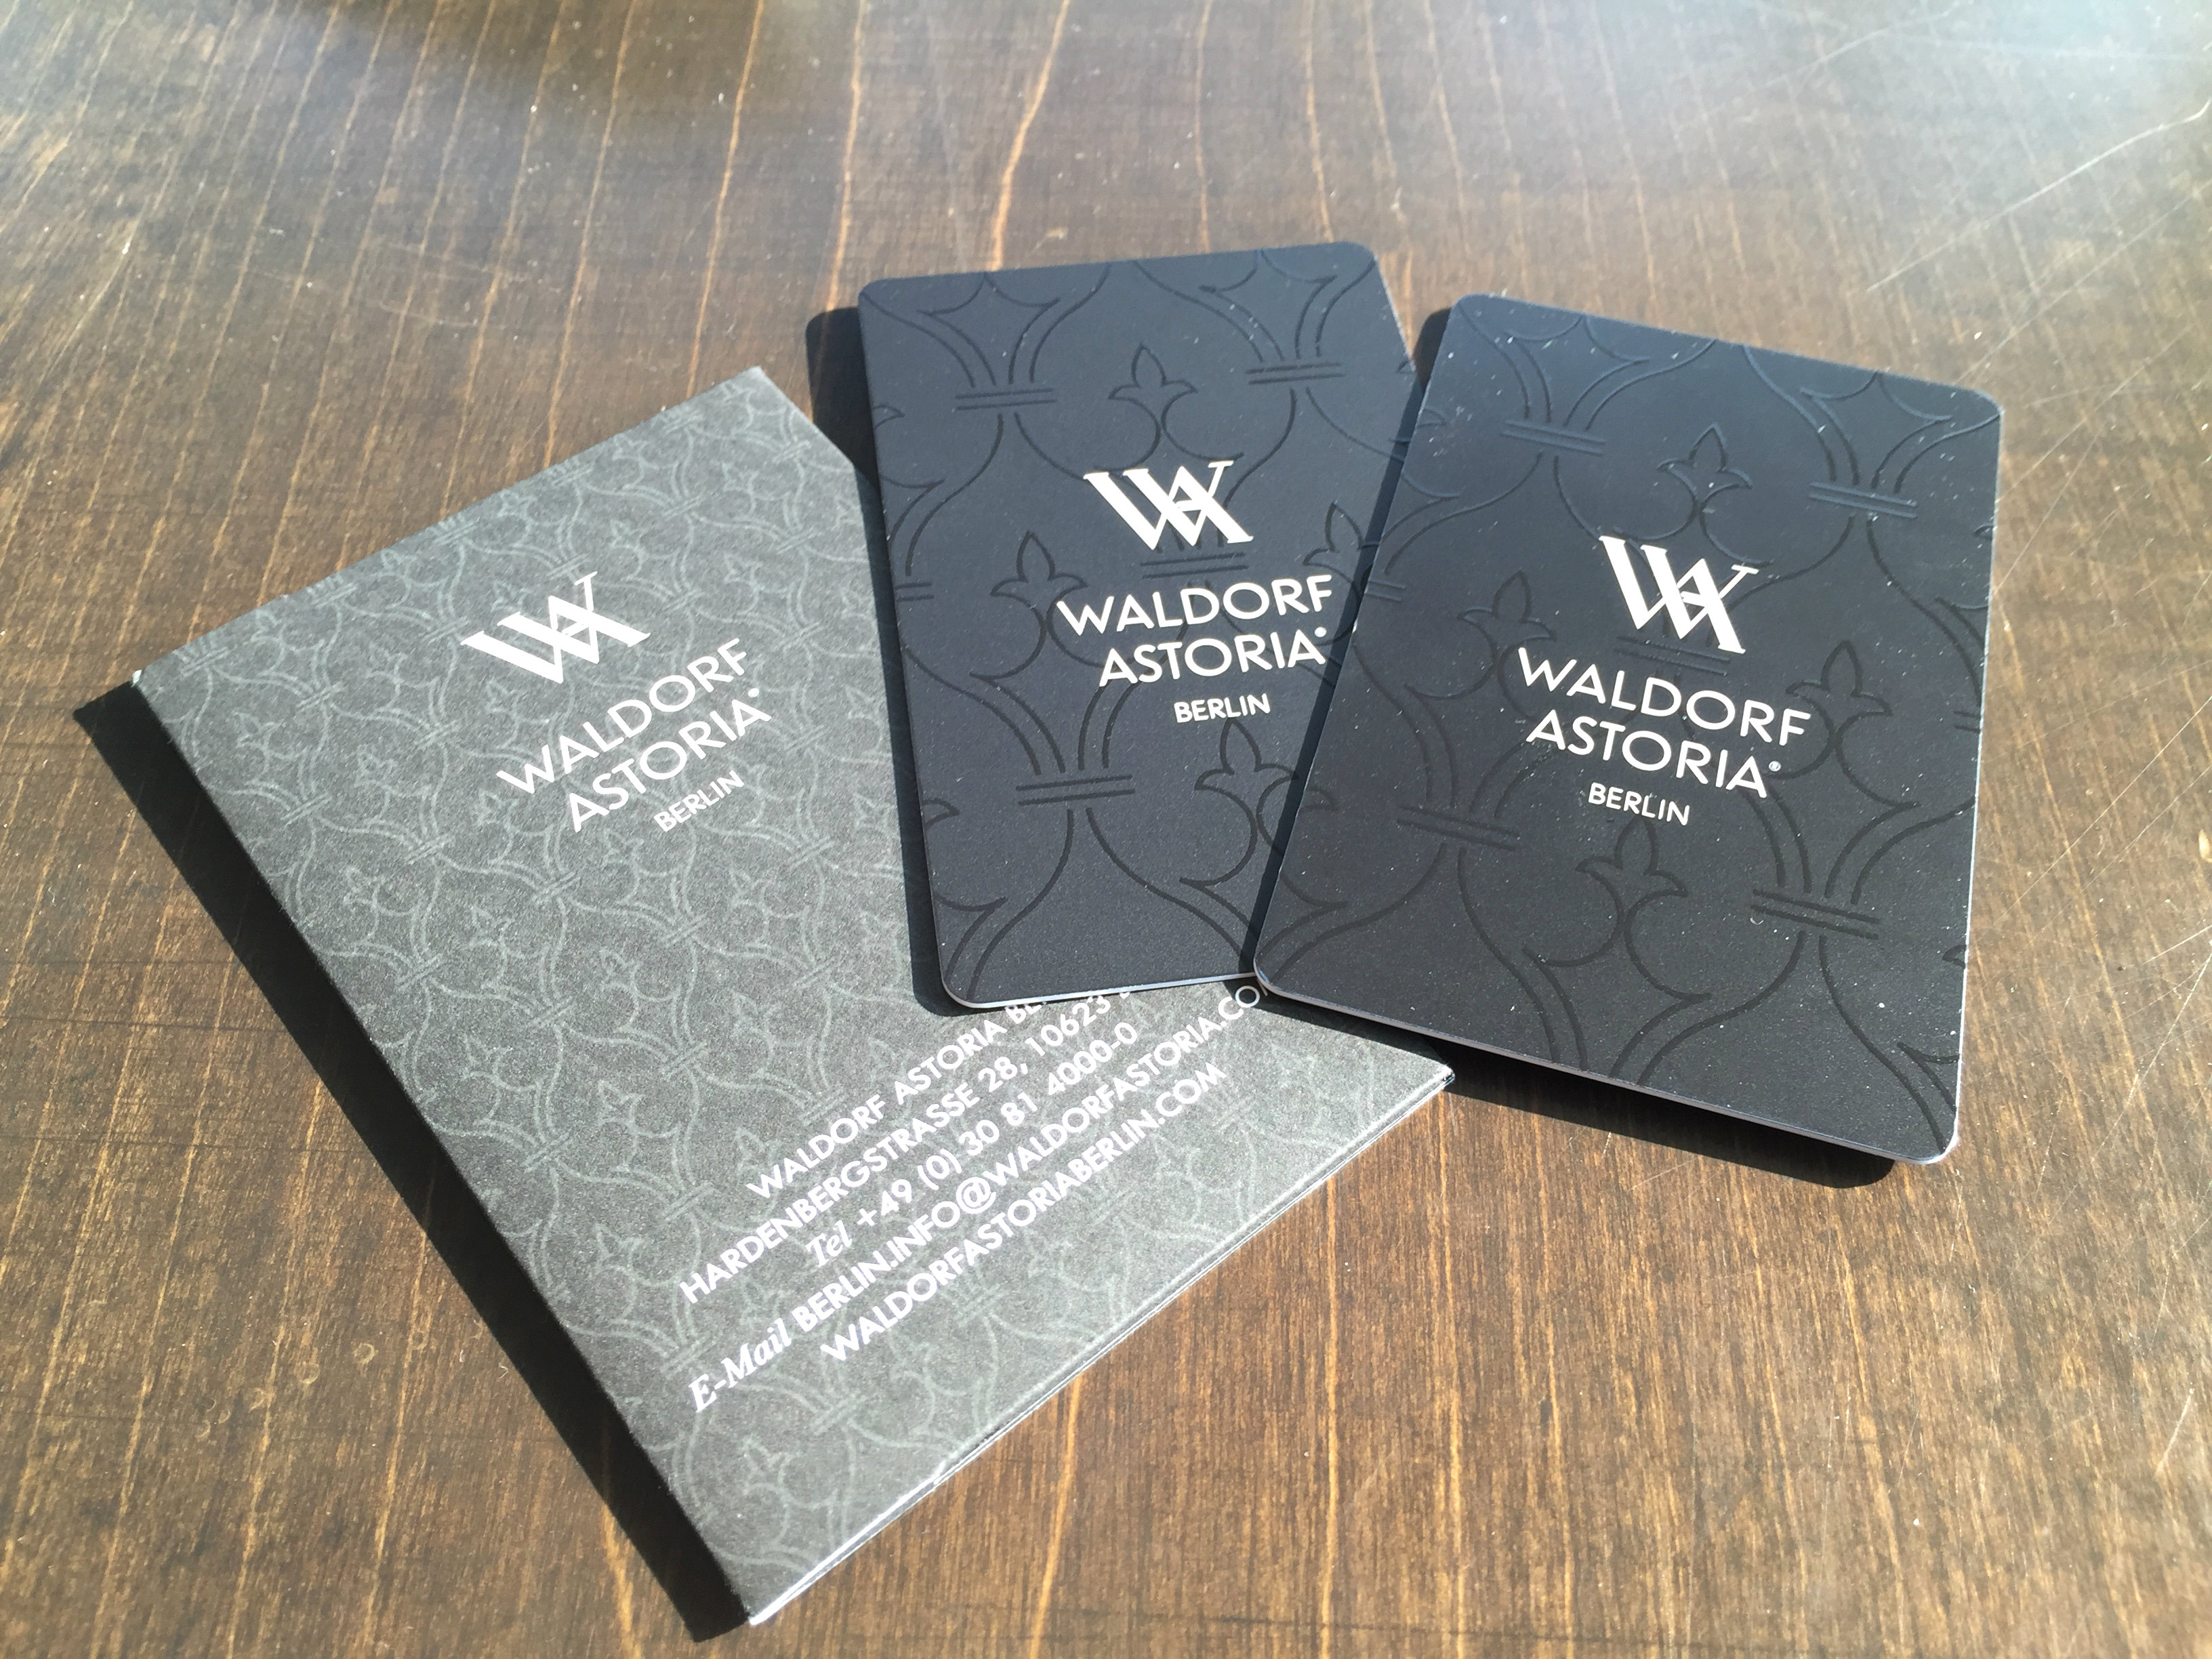 Waldorf Astoria Berlin keycard